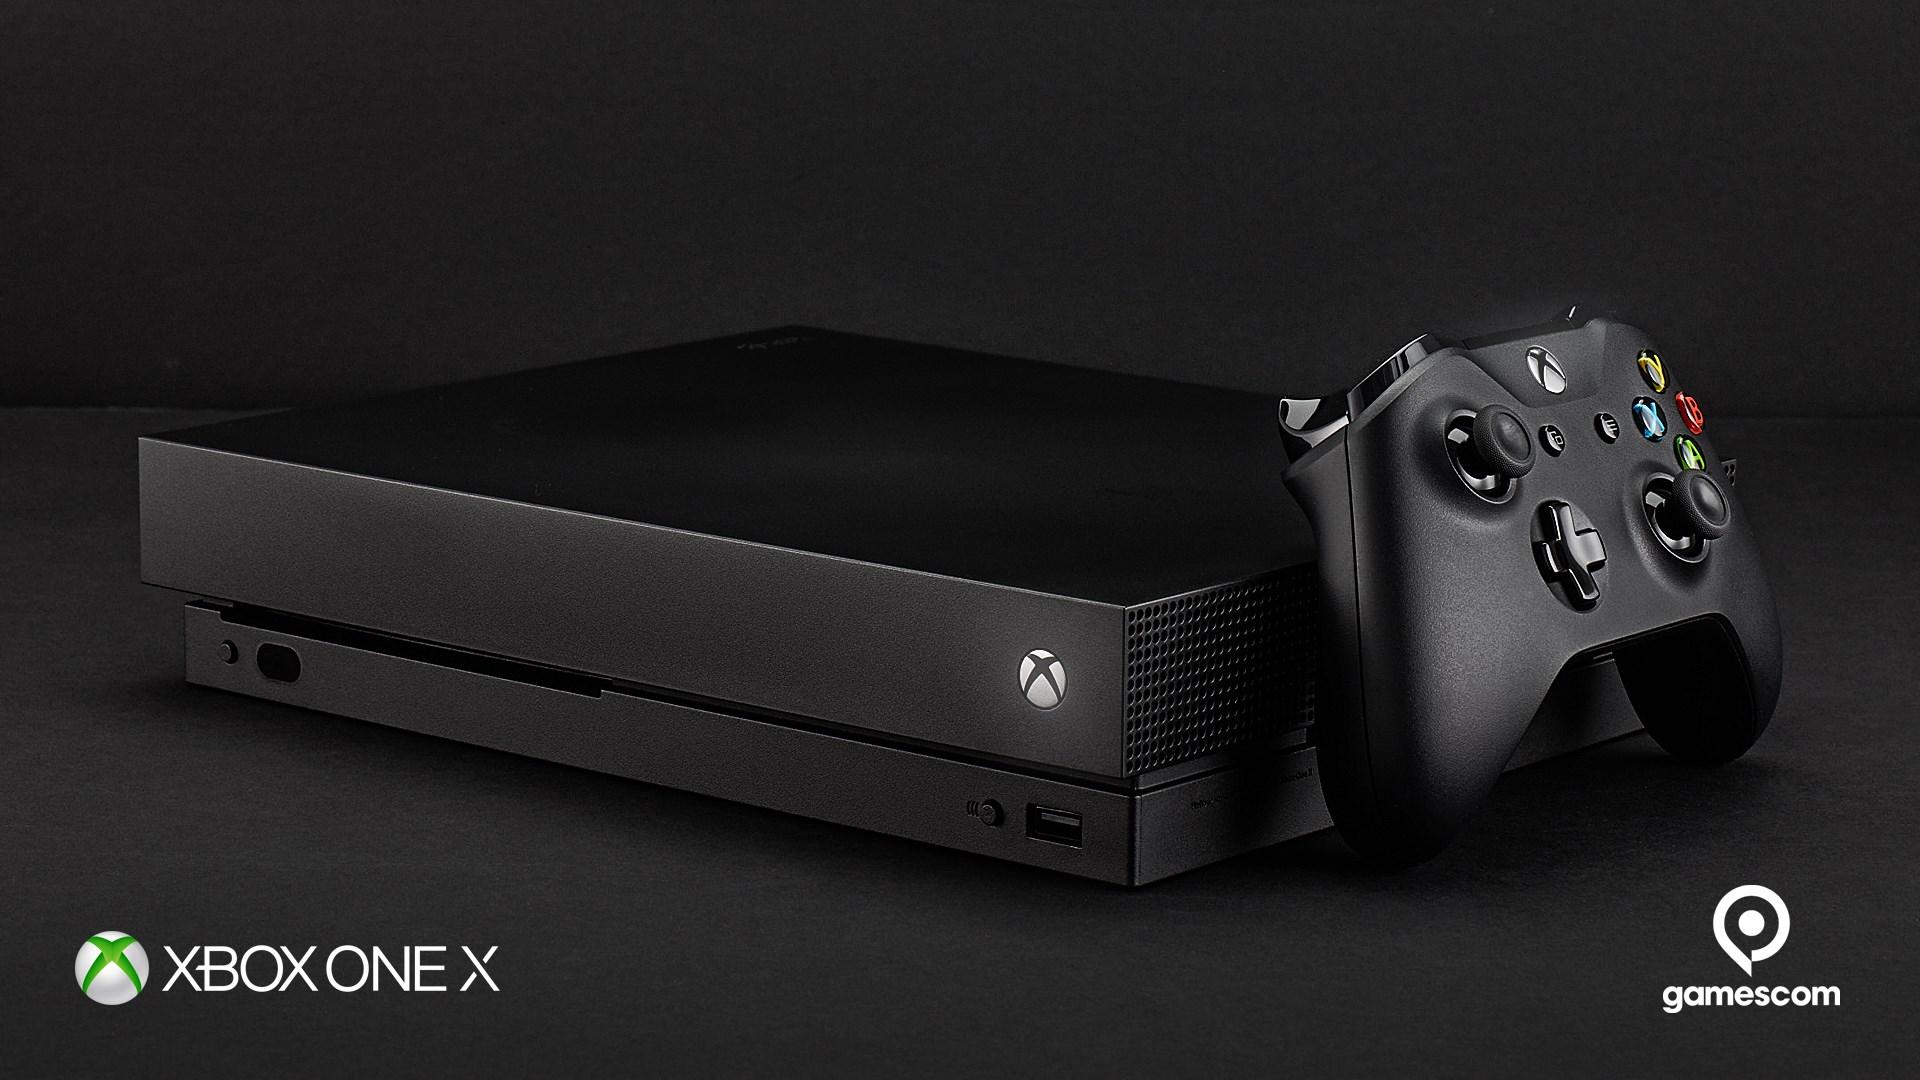 Watch Microsoft's Gamescom 2017 press conference here